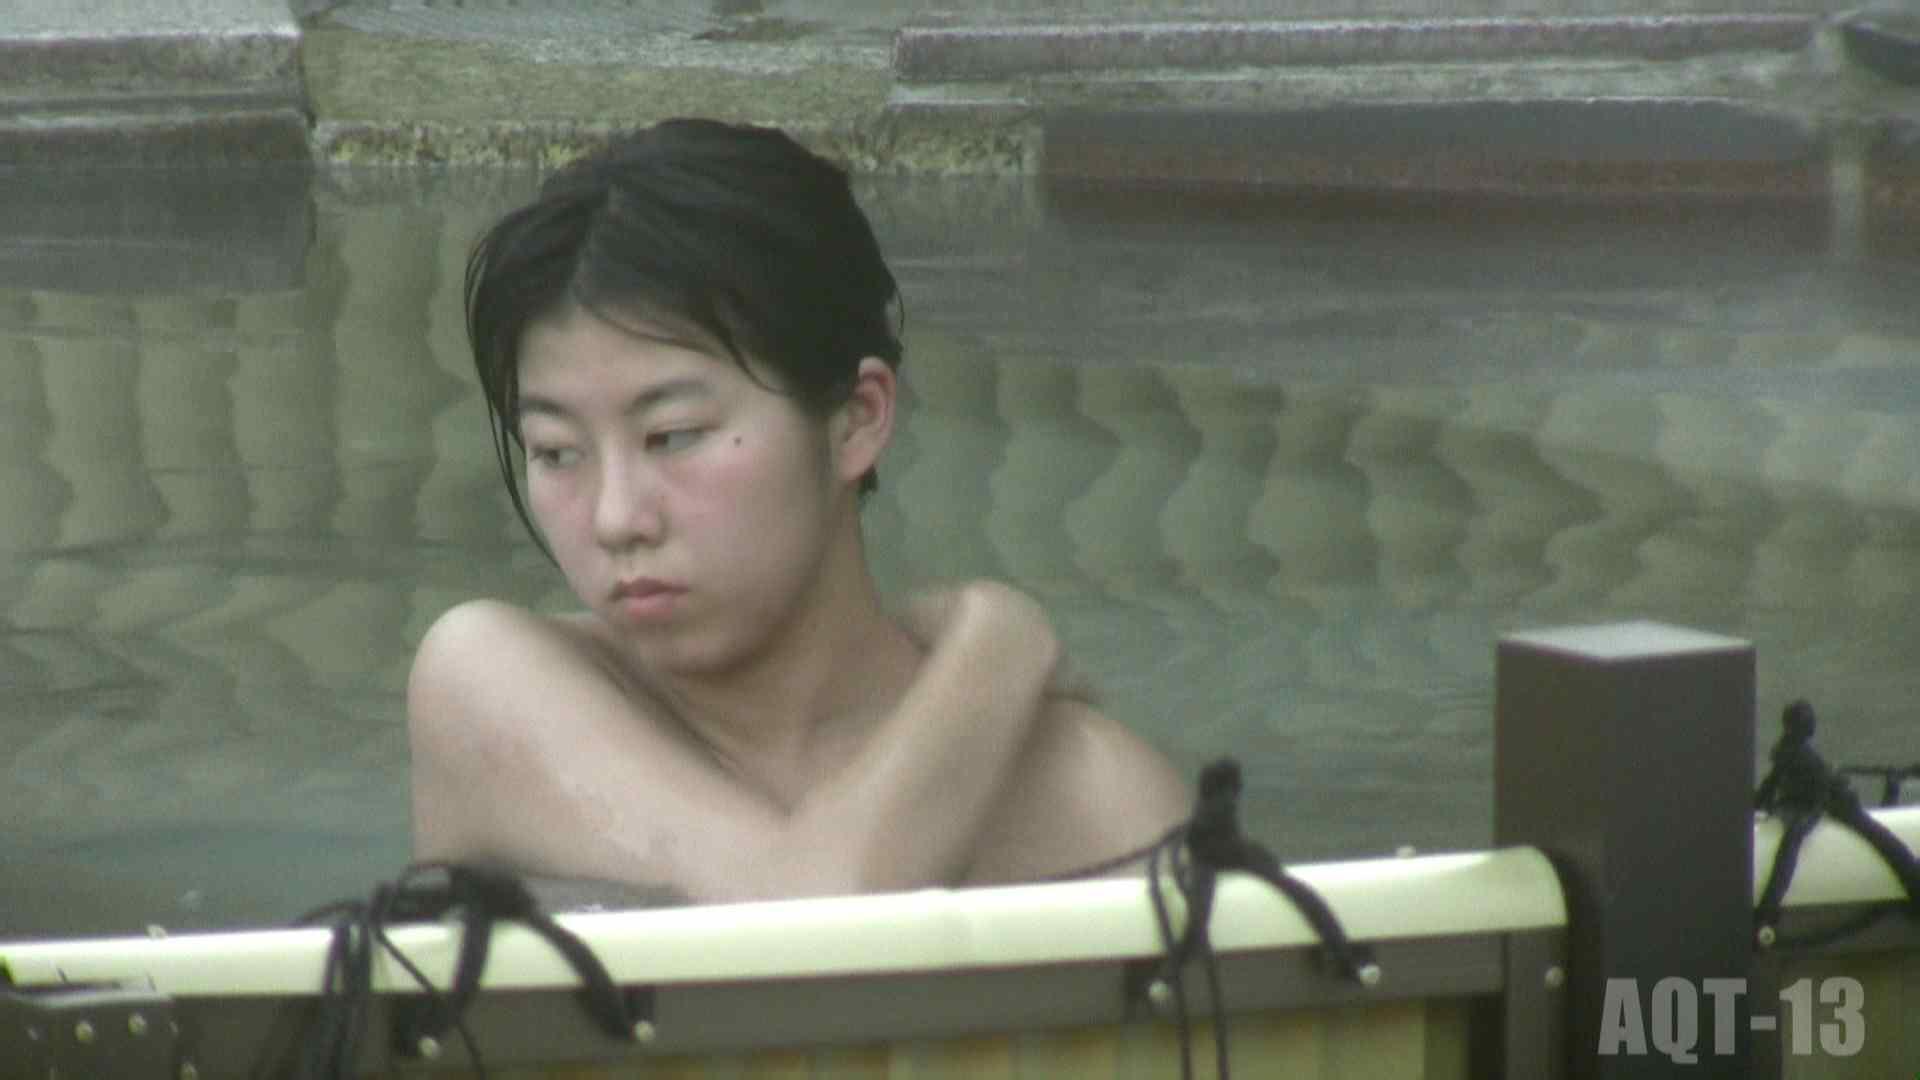 Aquaな露天風呂Vol.816 OLセックス  80画像 63